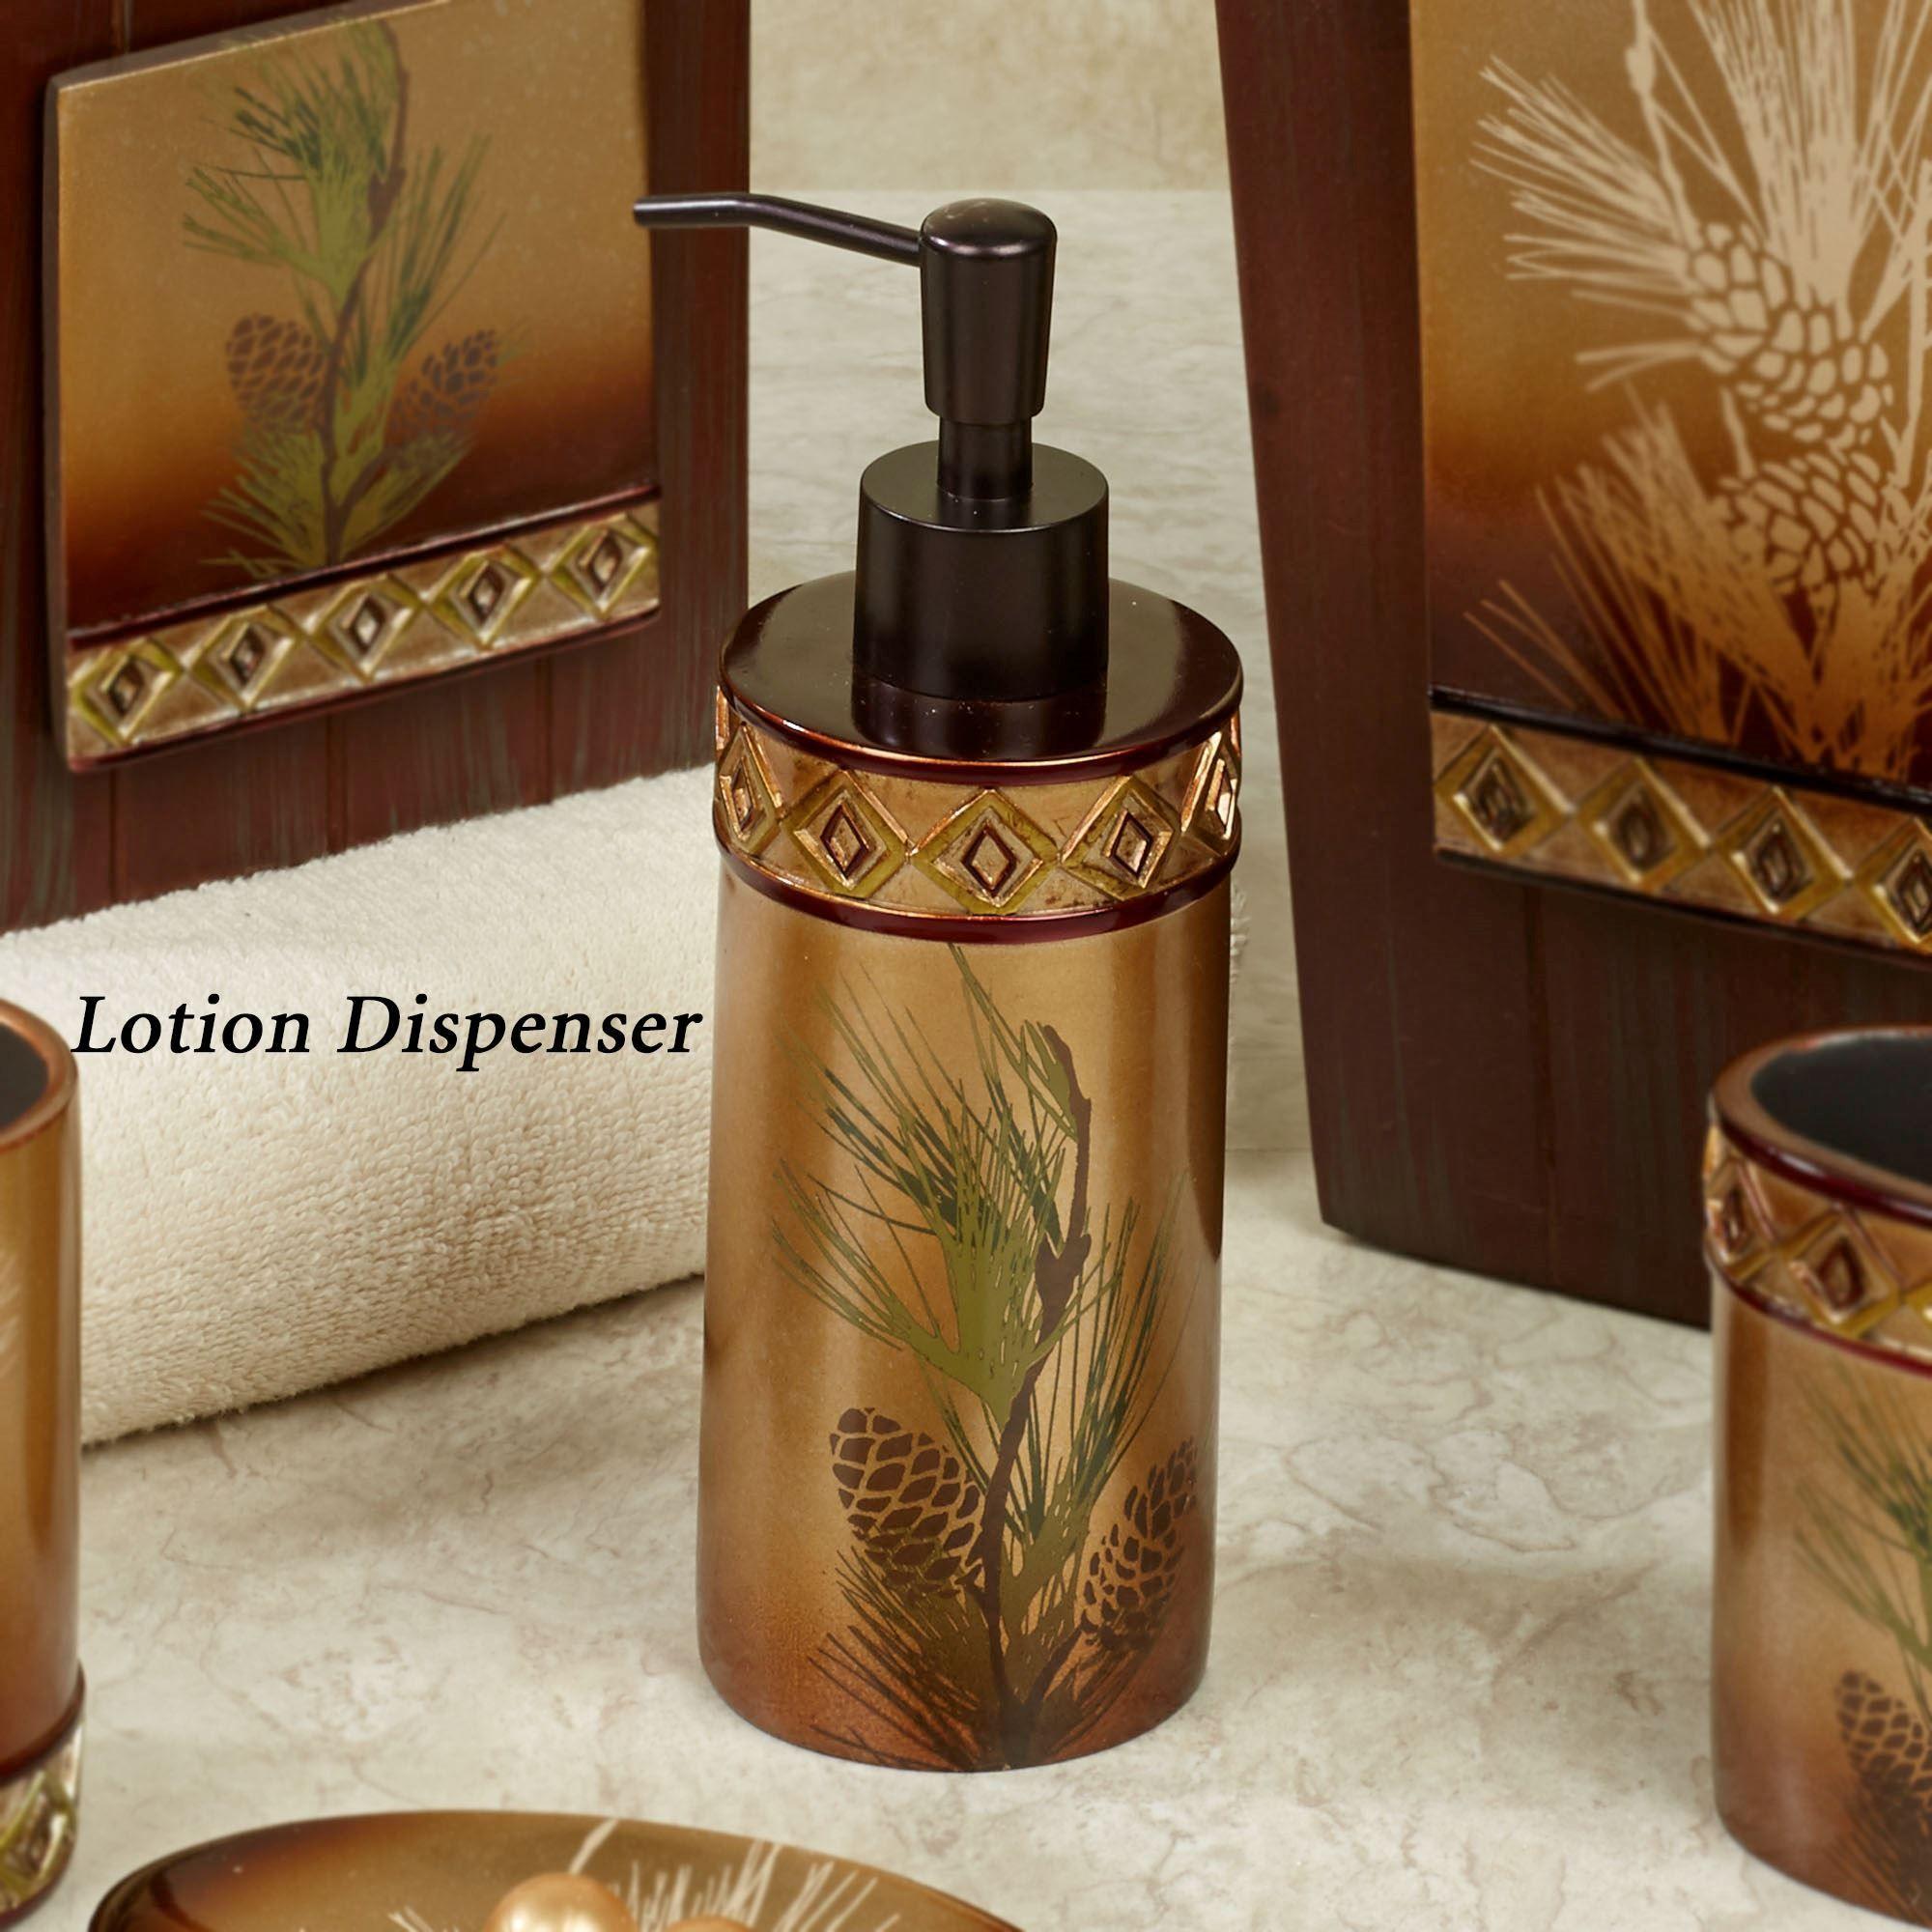 Pine Cone Silhouettes Lotion Soap Dispenser Brown